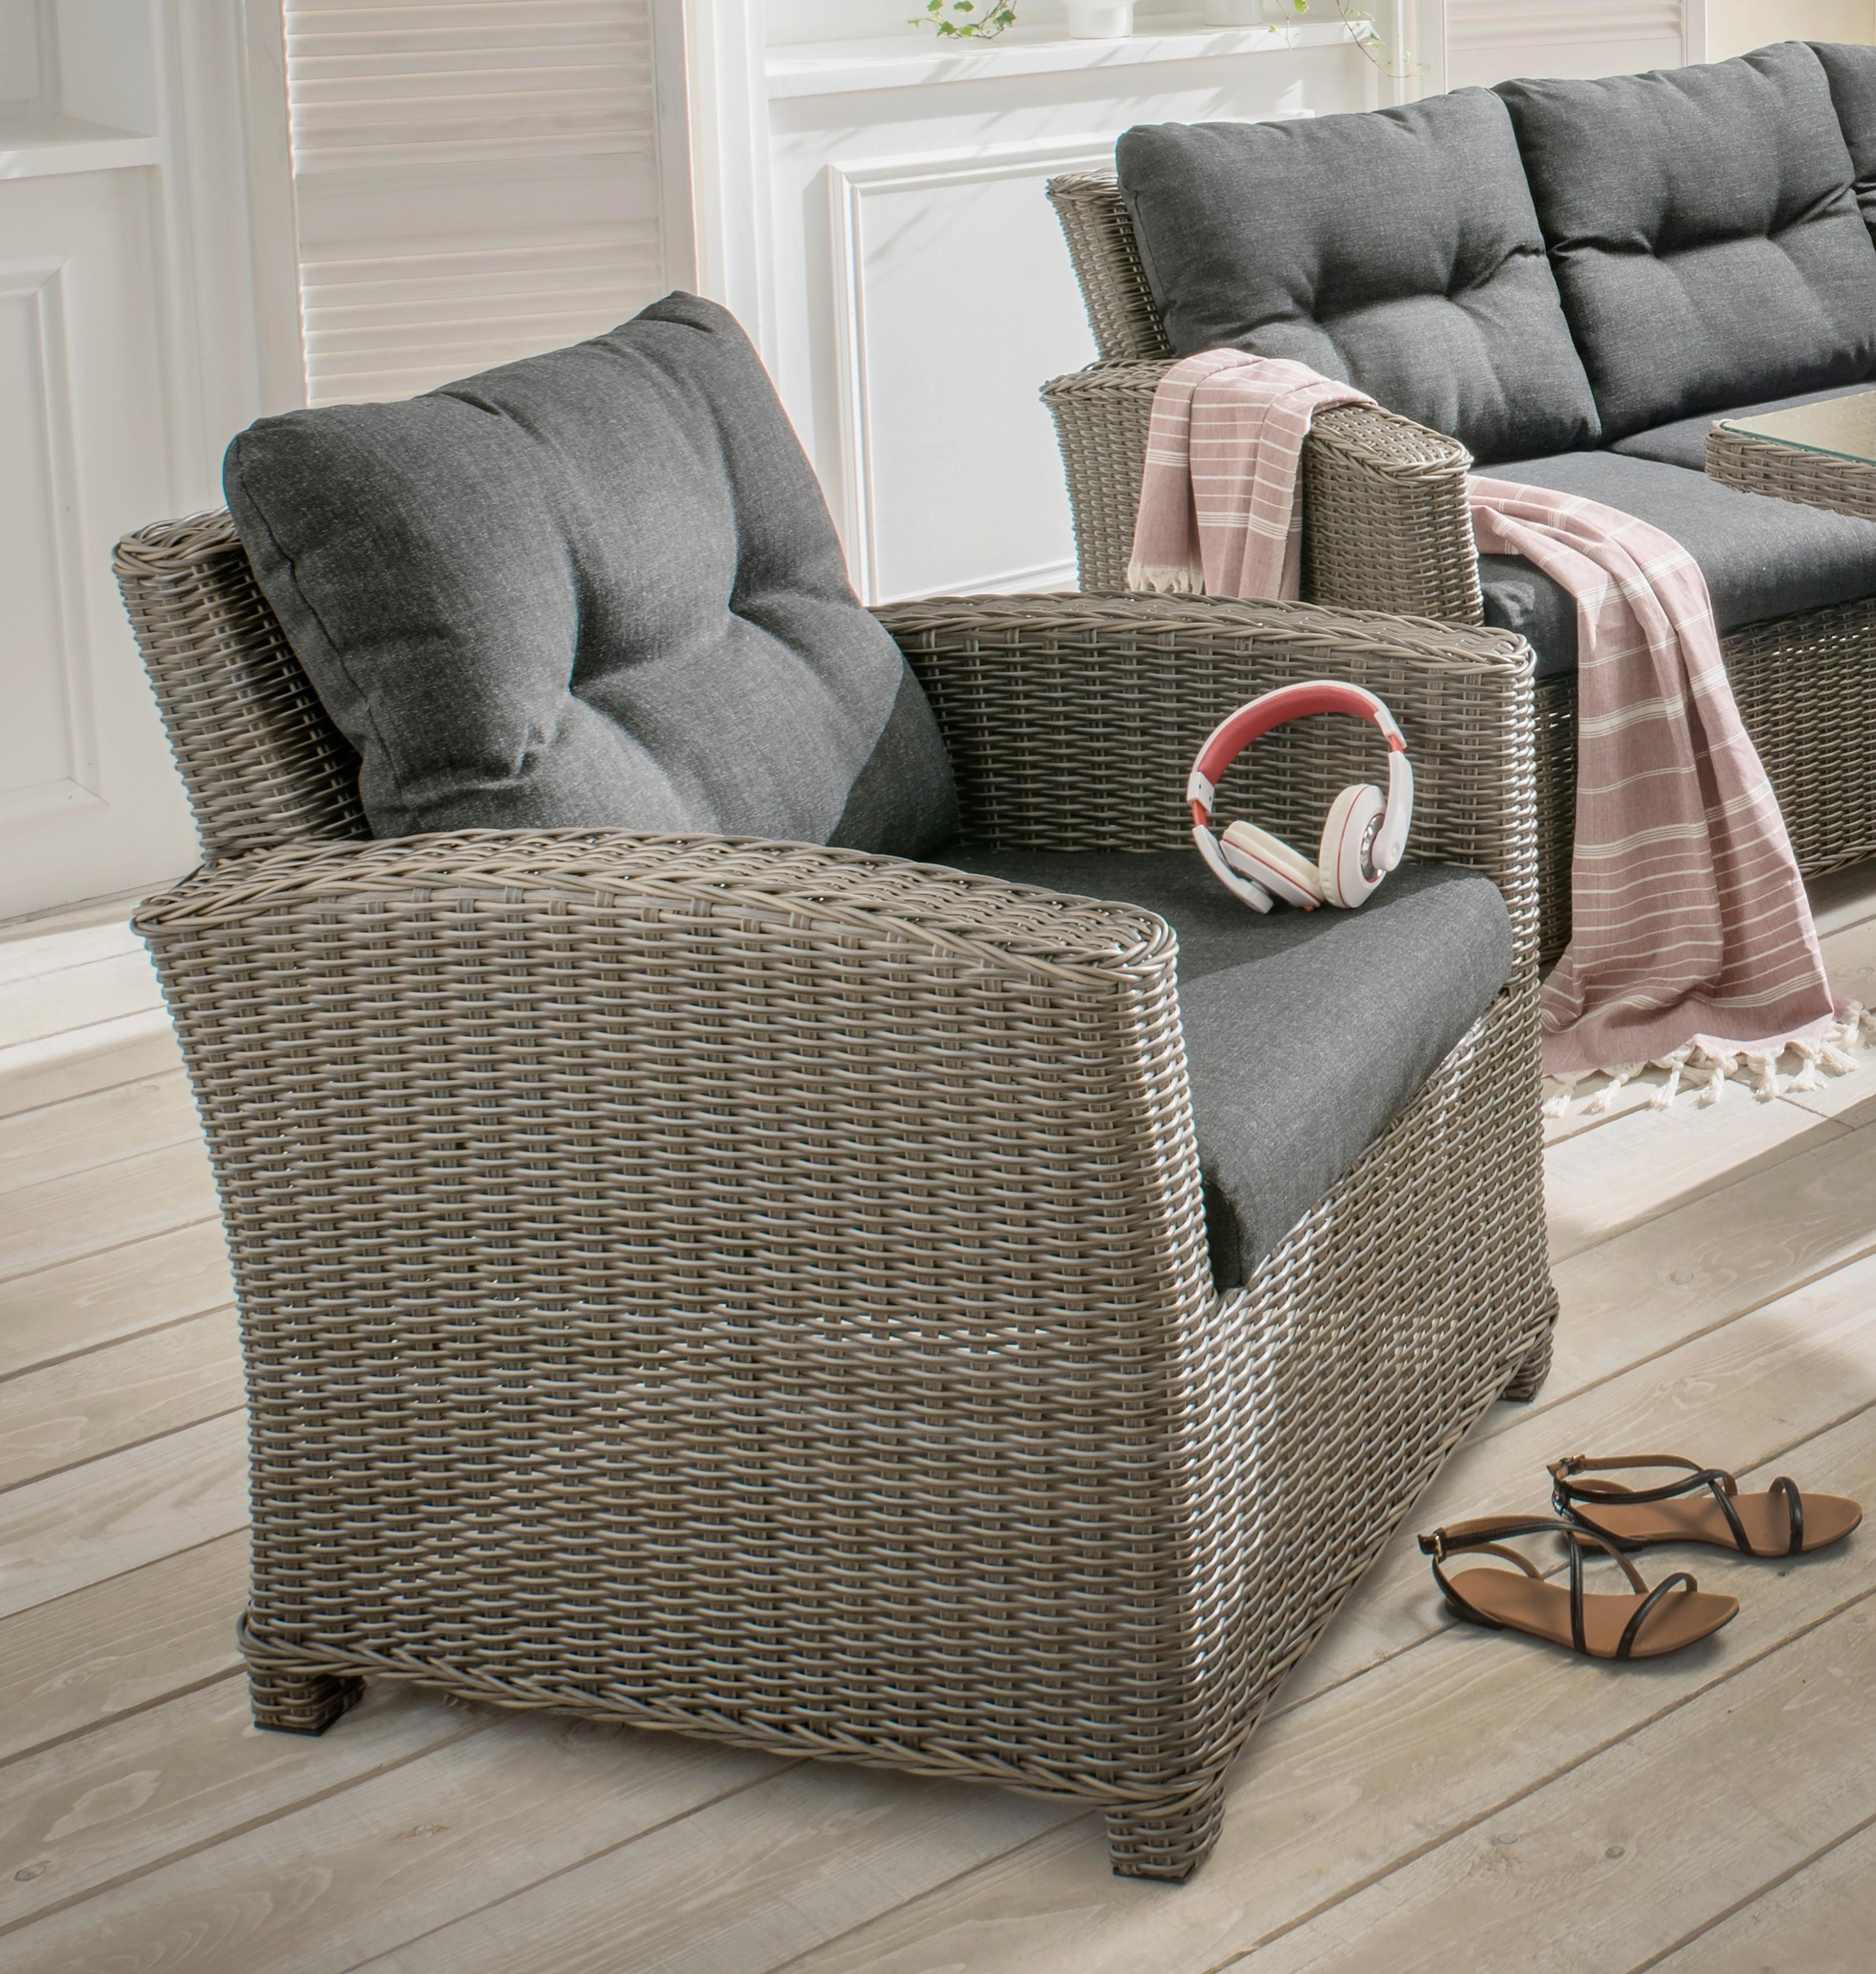 DESTINY Sessel Riviera Polyrattan inkl Auflage